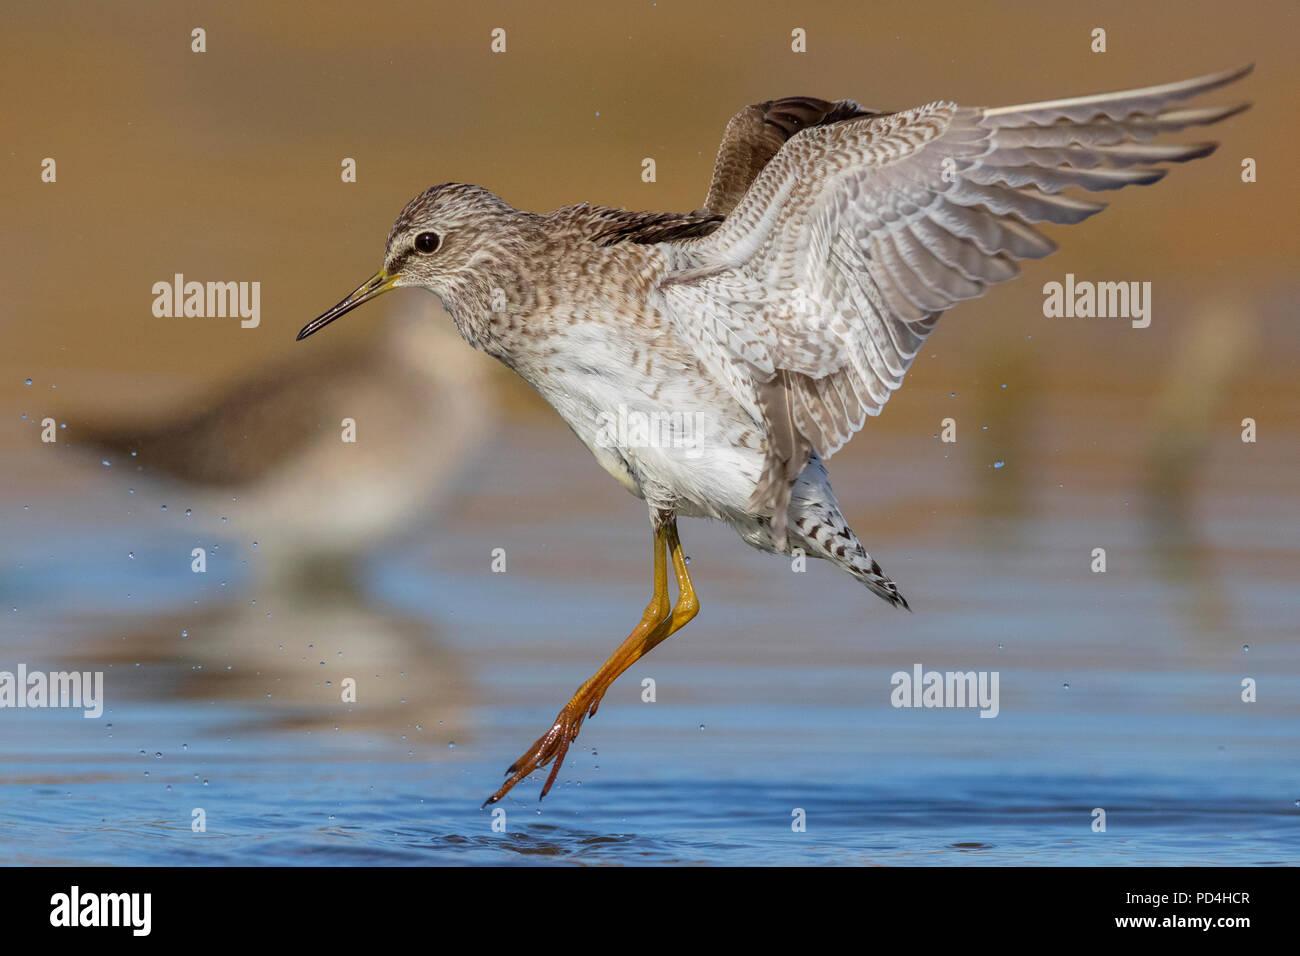 Wood Sandpiper (Tringa glareola), adult in flight - Stock Image